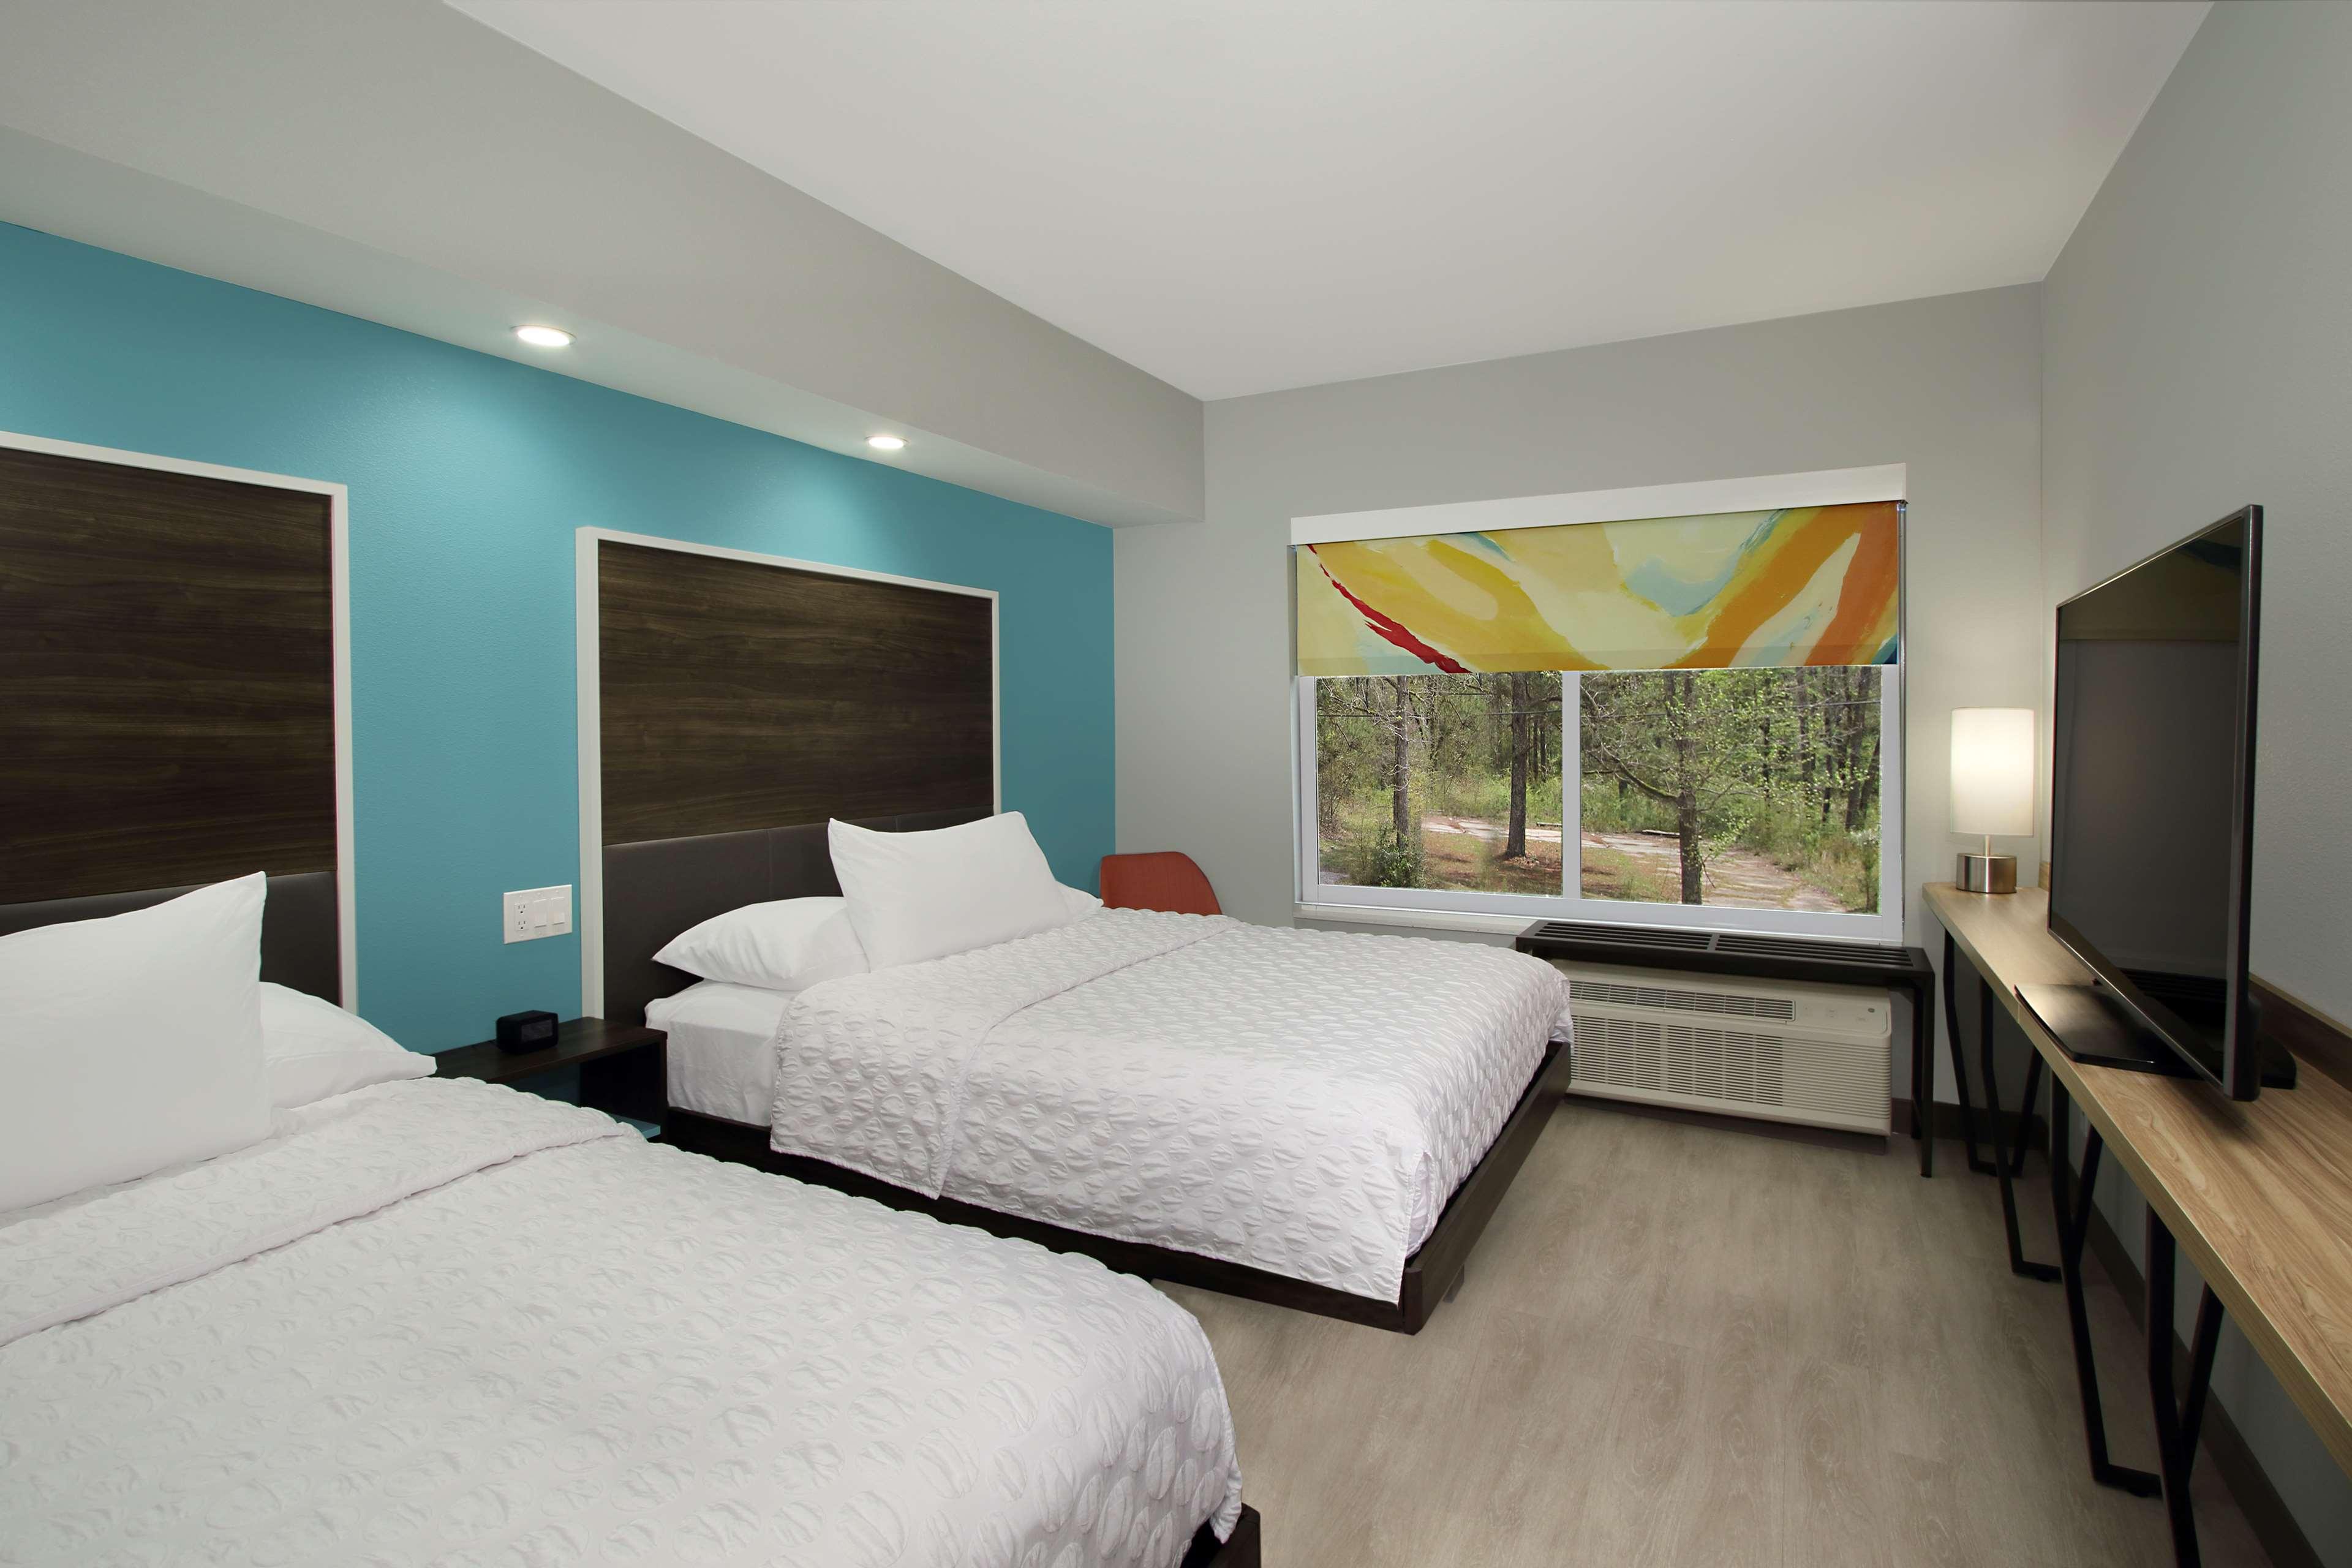 Tru by Hilton Meridian image 27